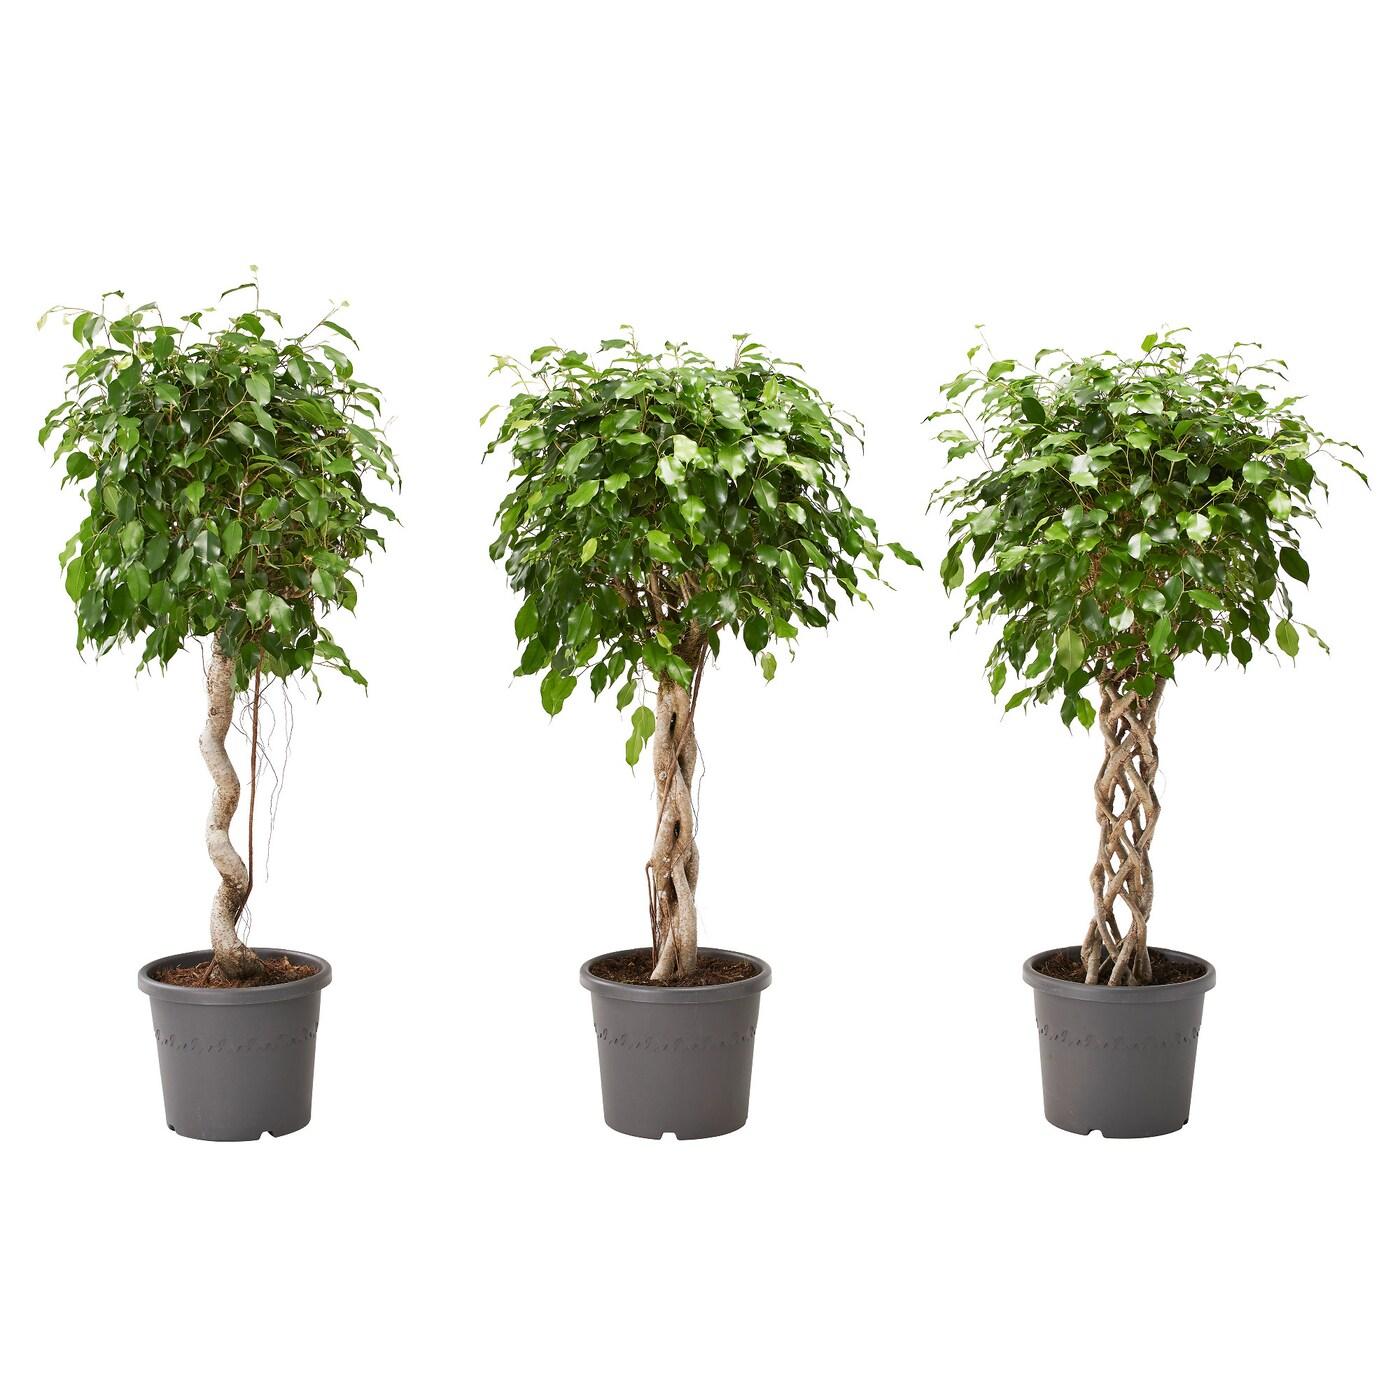 Ficus Benjamin Perde Foglie ficus benjamina pianta da vaso - ficus benjamina, specie varie 32 cm